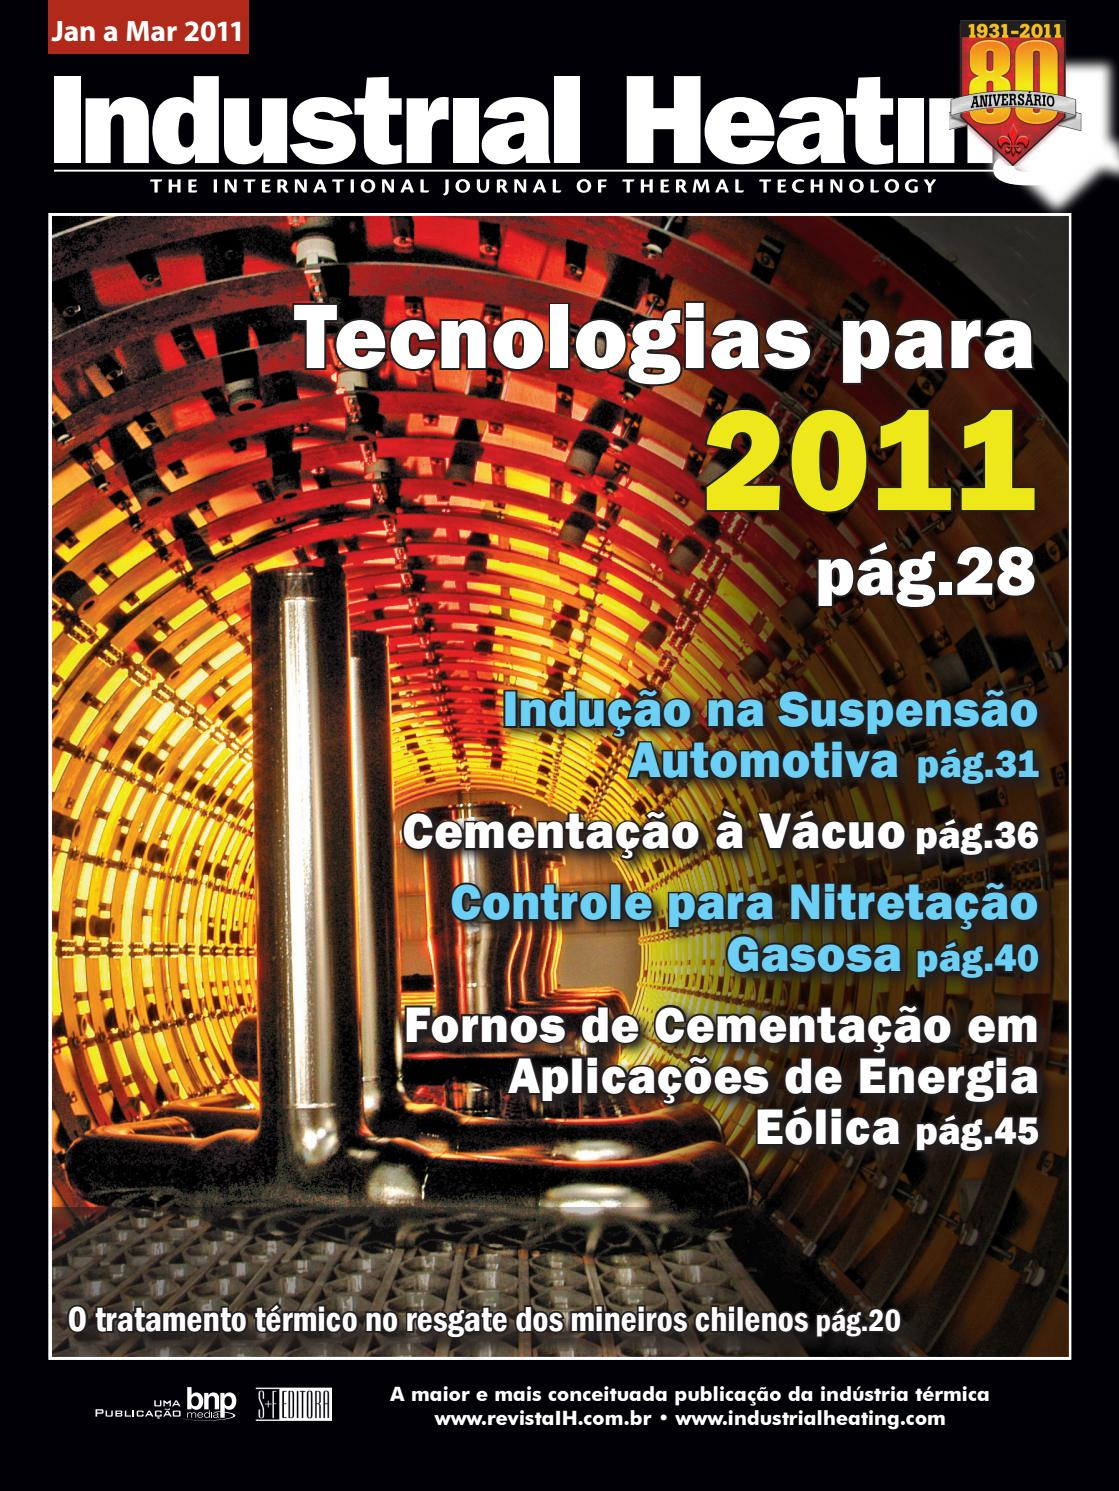 Revista Industrial Heating - Jan a Mar 2011 by S+F Editora - issuu c545c0d8fe